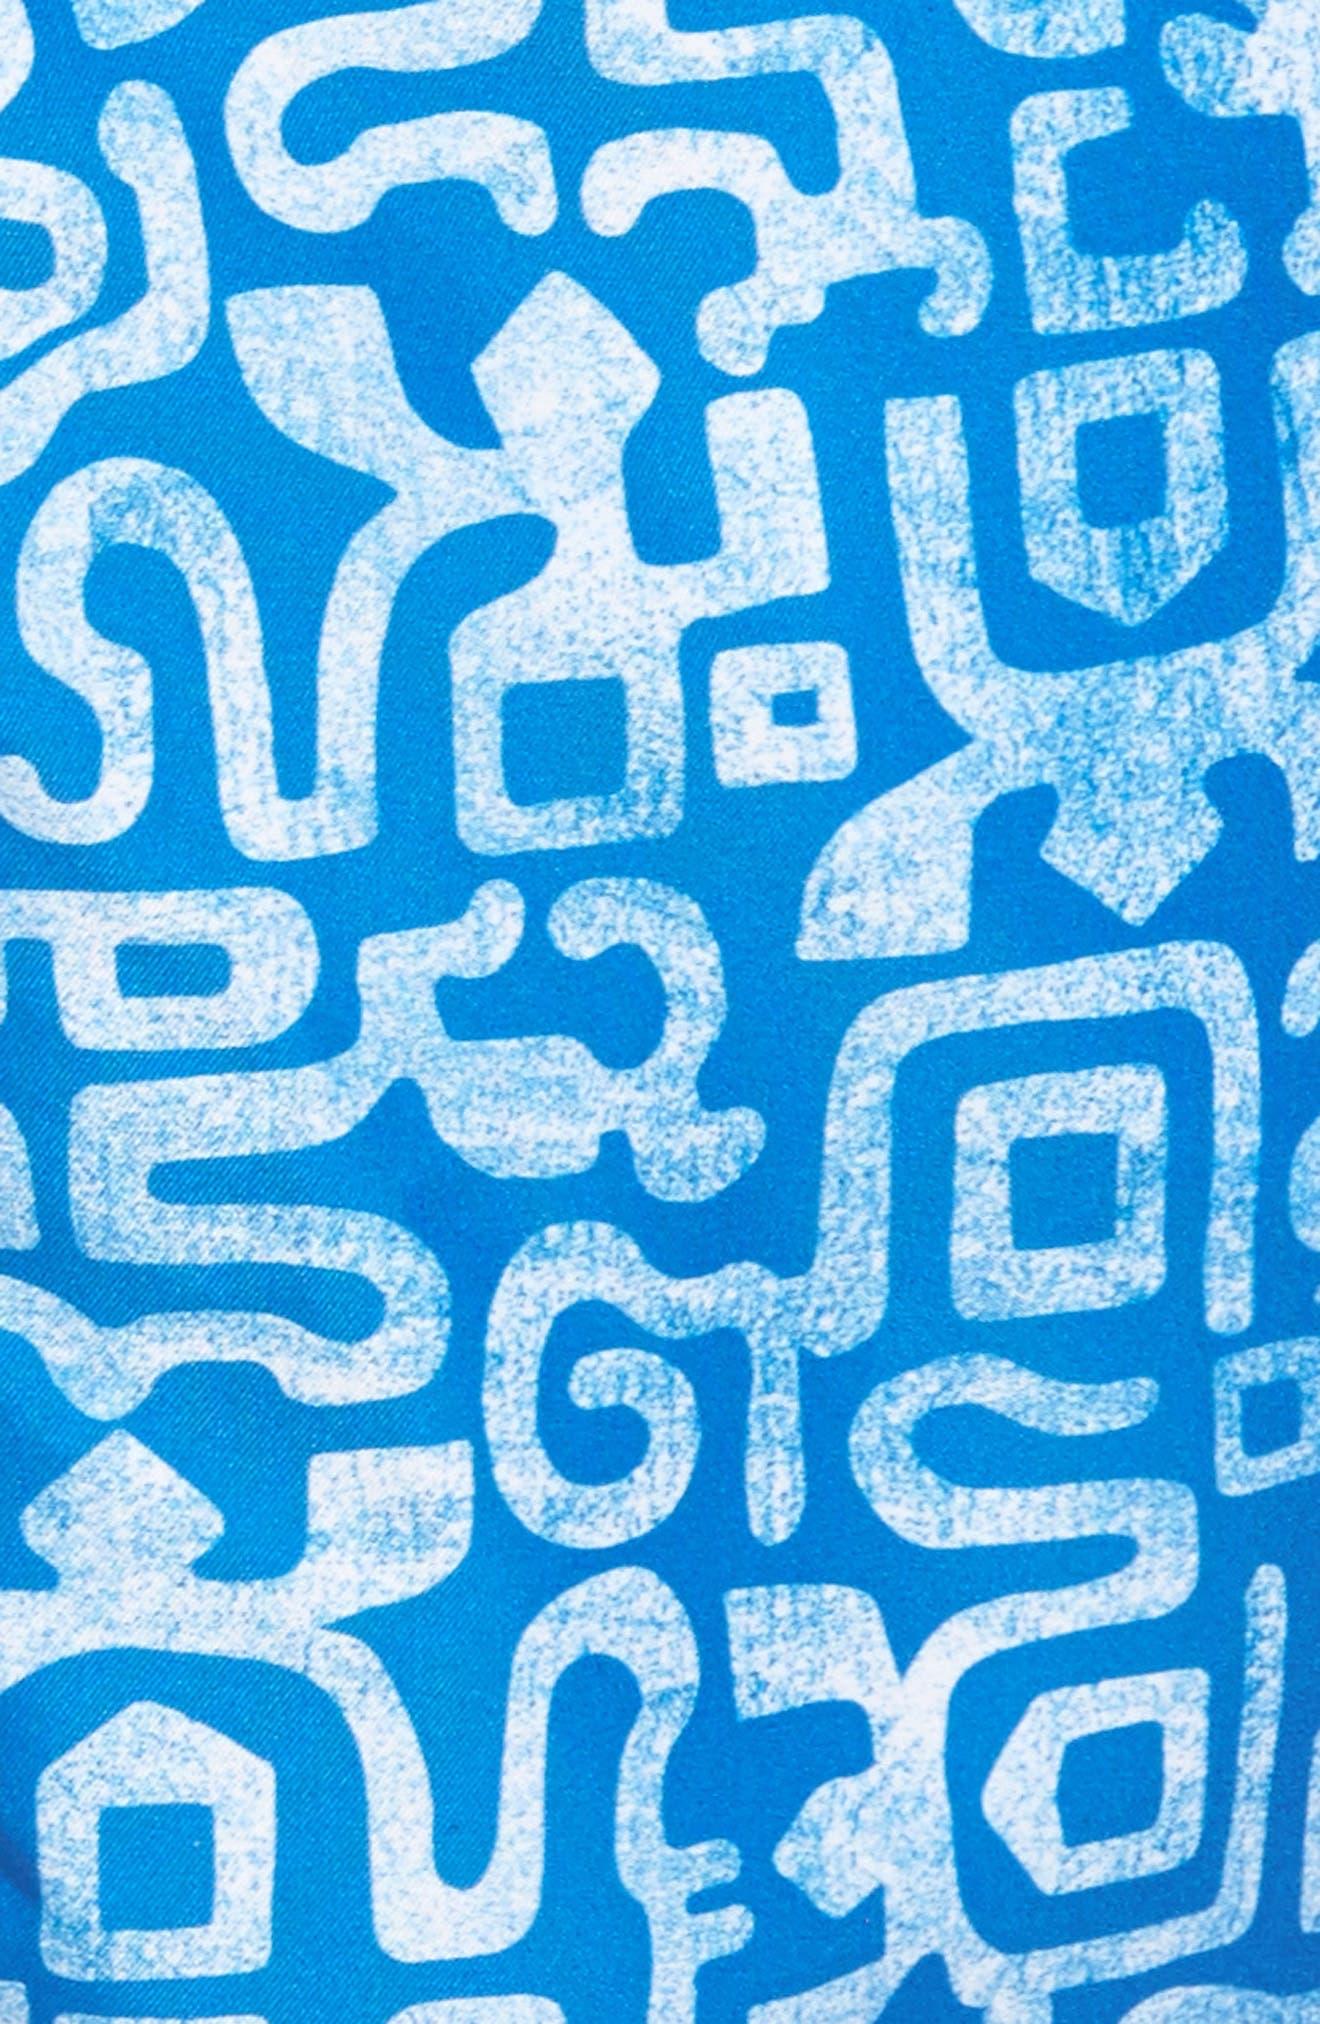 Trunks Swim & Surf CO. Swami Geo Print Board Shorts,                             Alternate thumbnail 5, color,                             Nautical Blue/ White